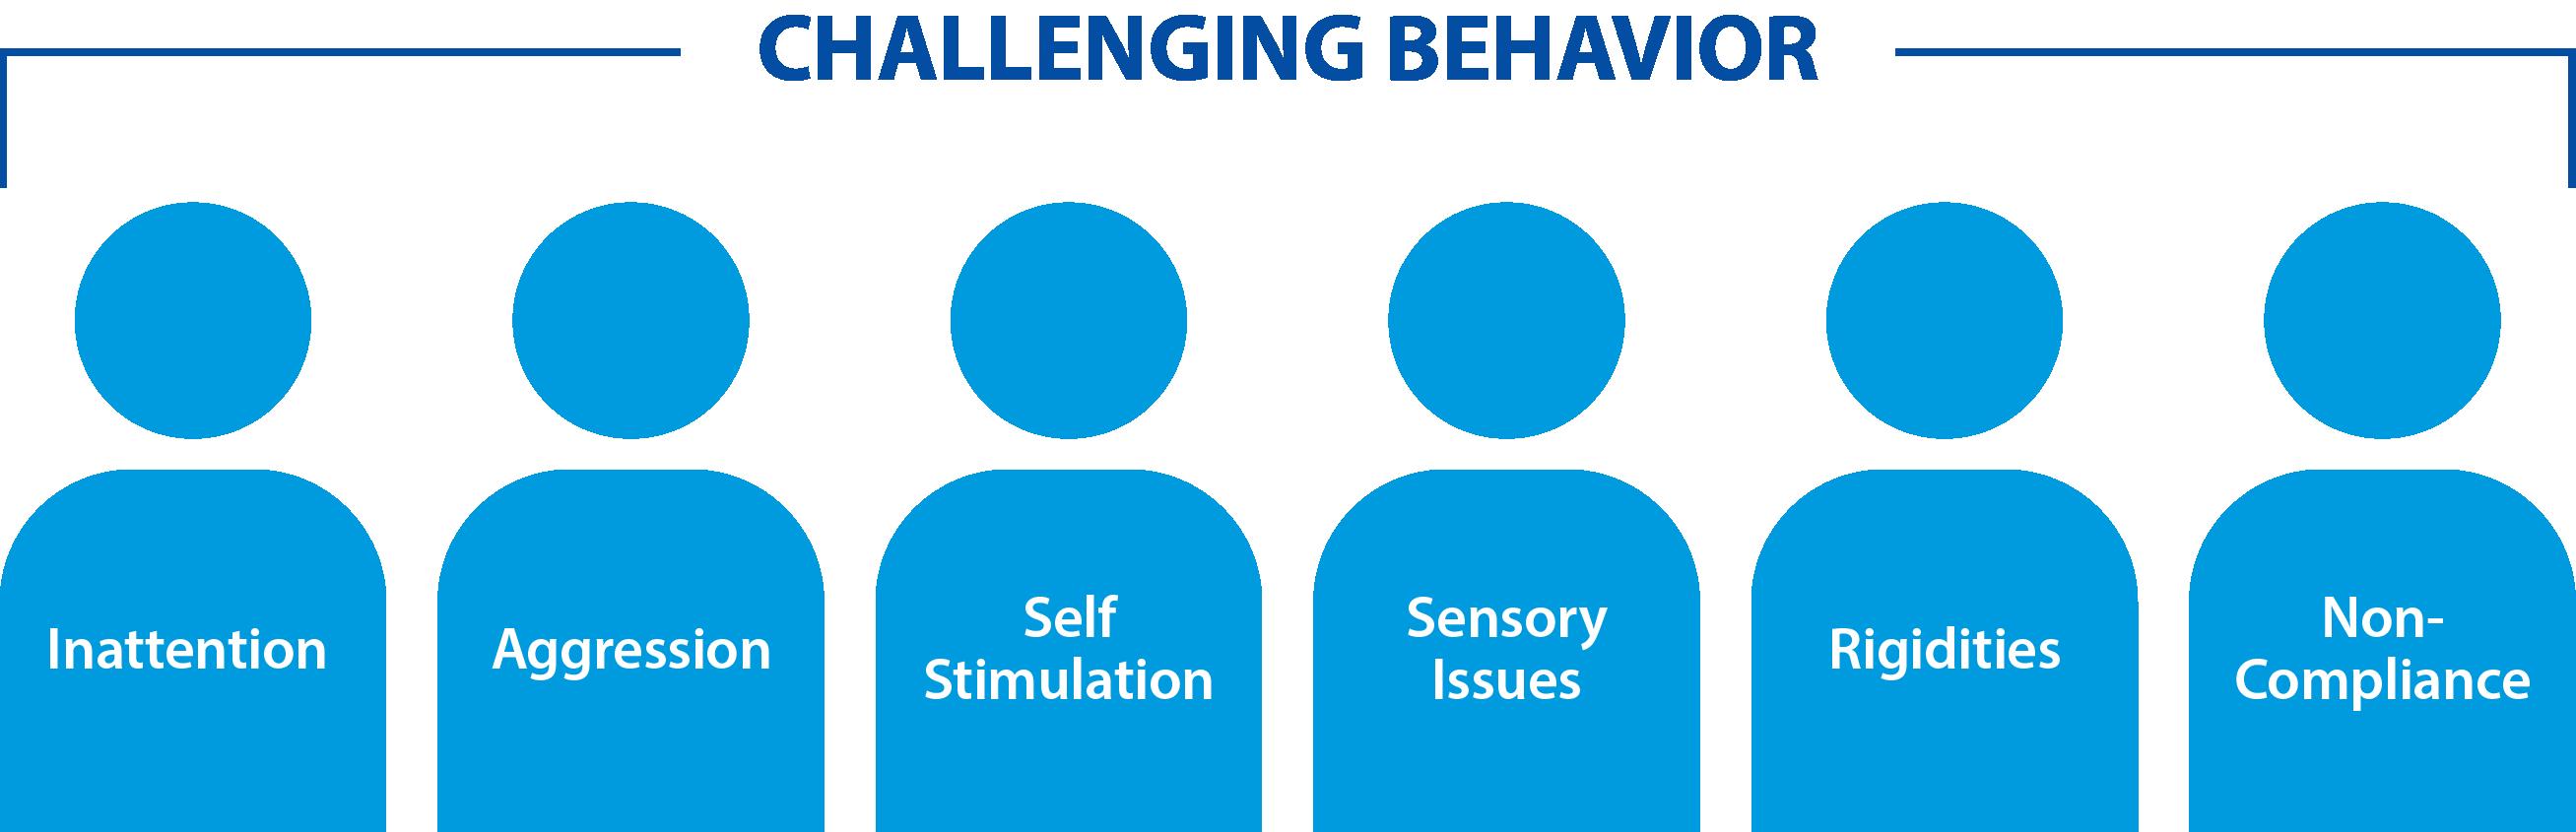 autism-partnership-aba-challenging-behavior